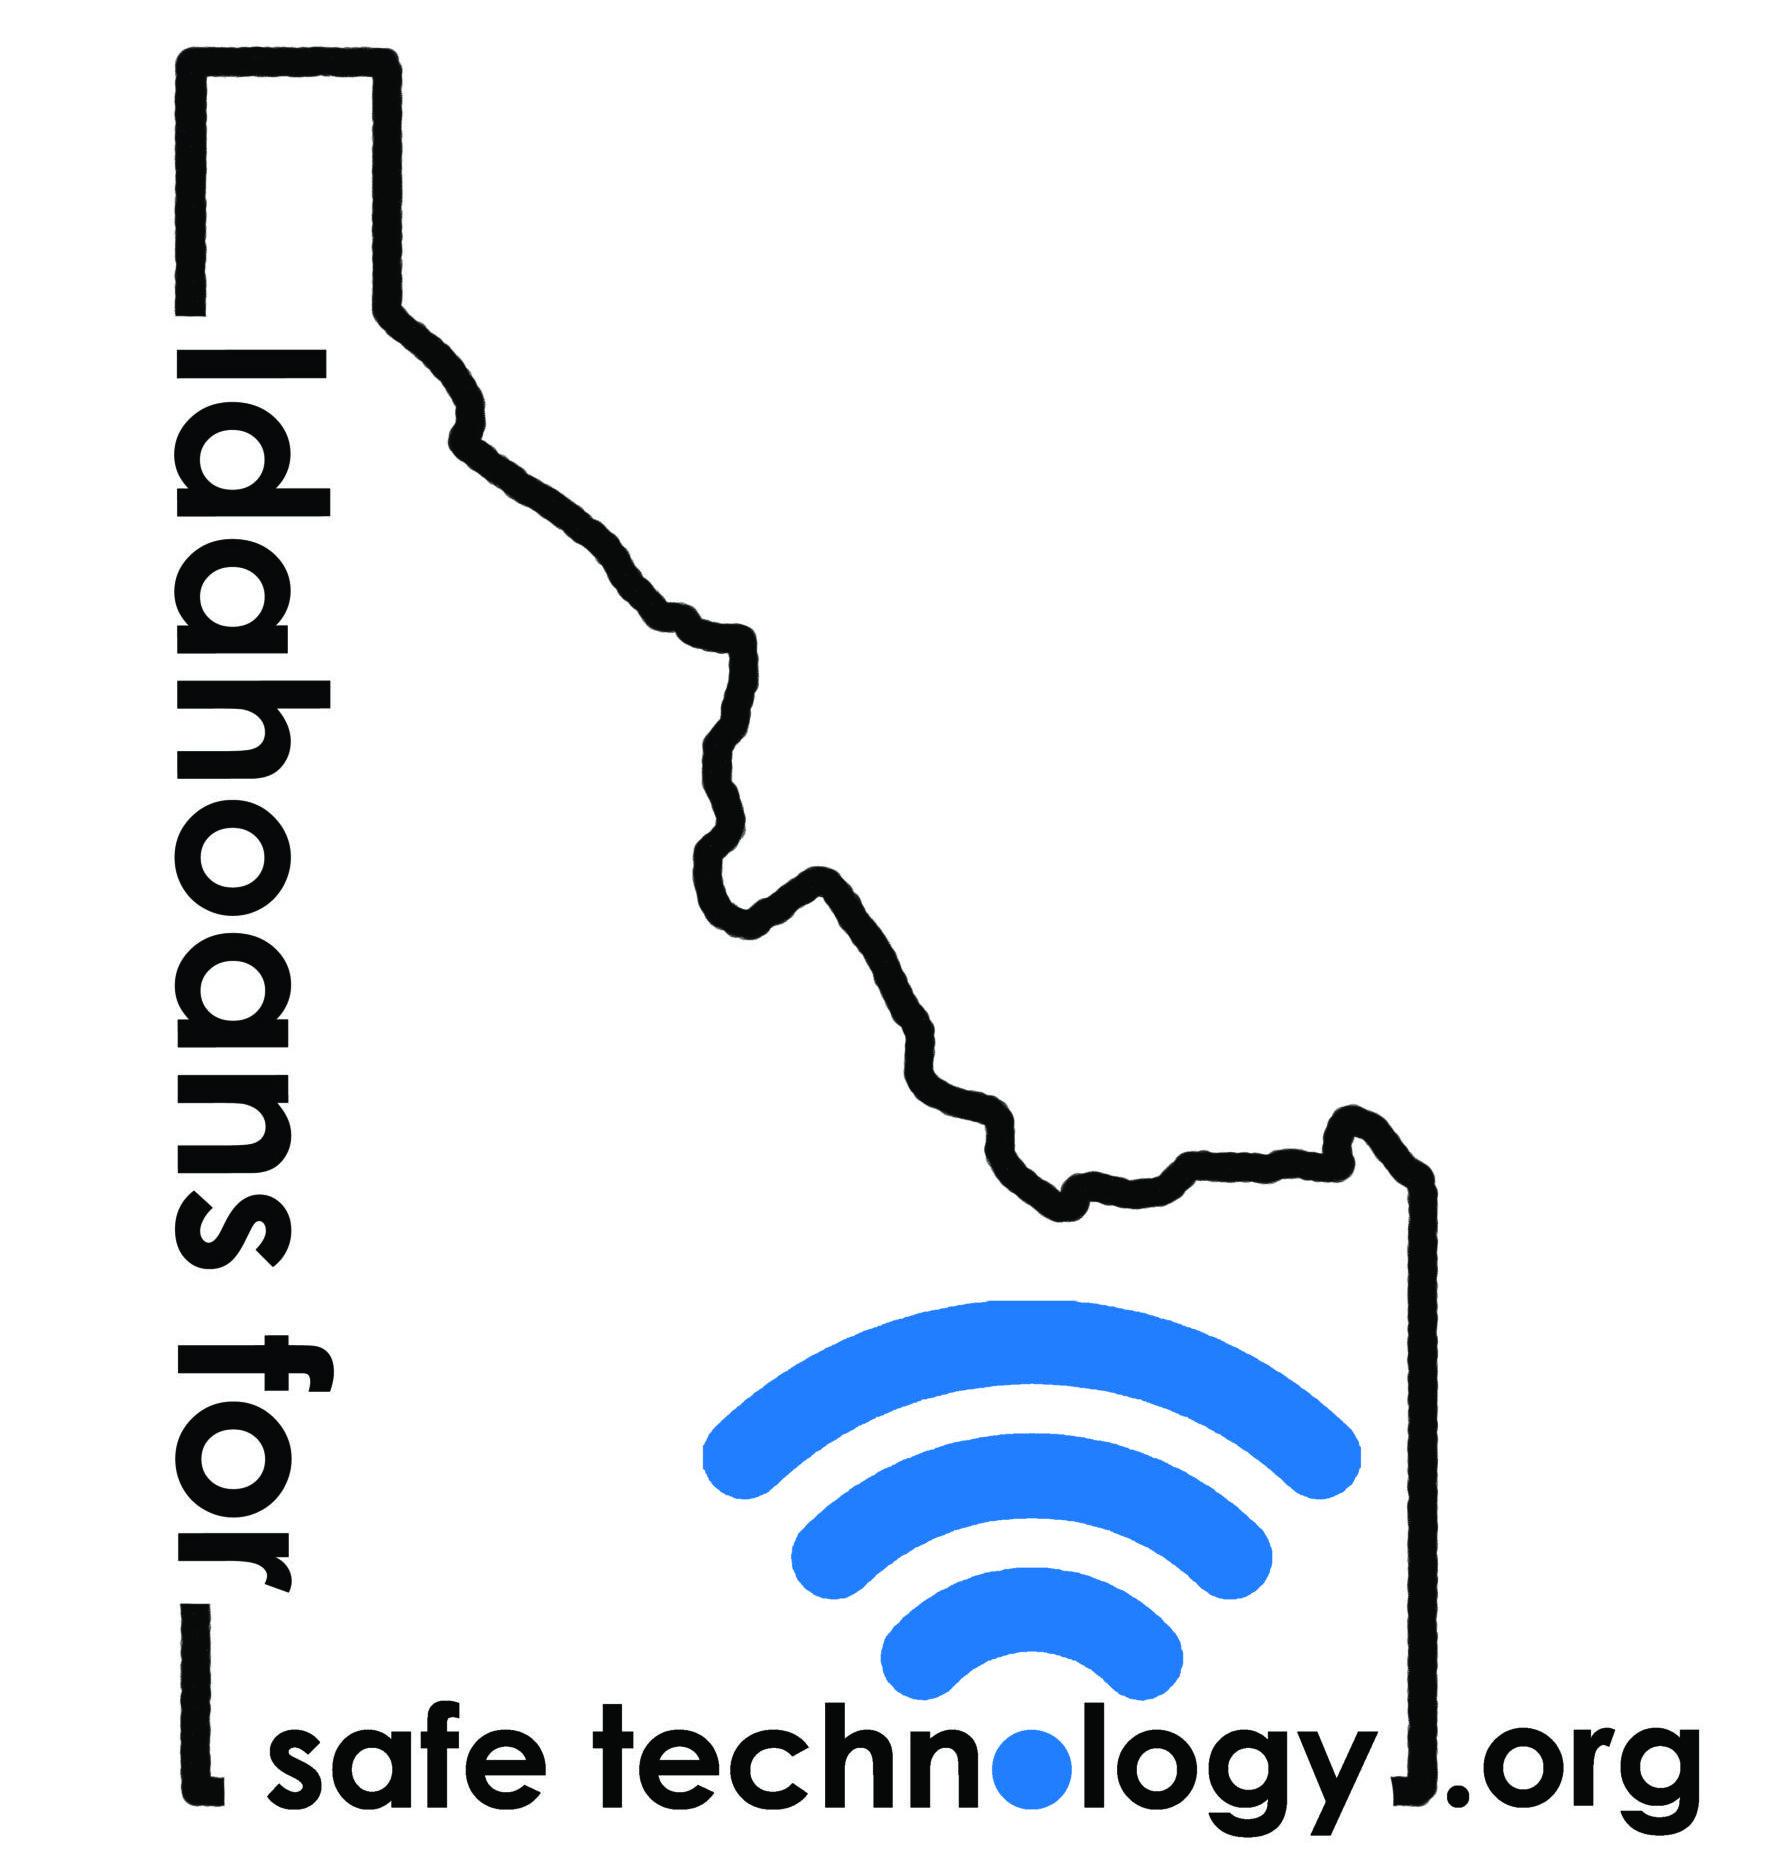 Idahoans for Safe Technology